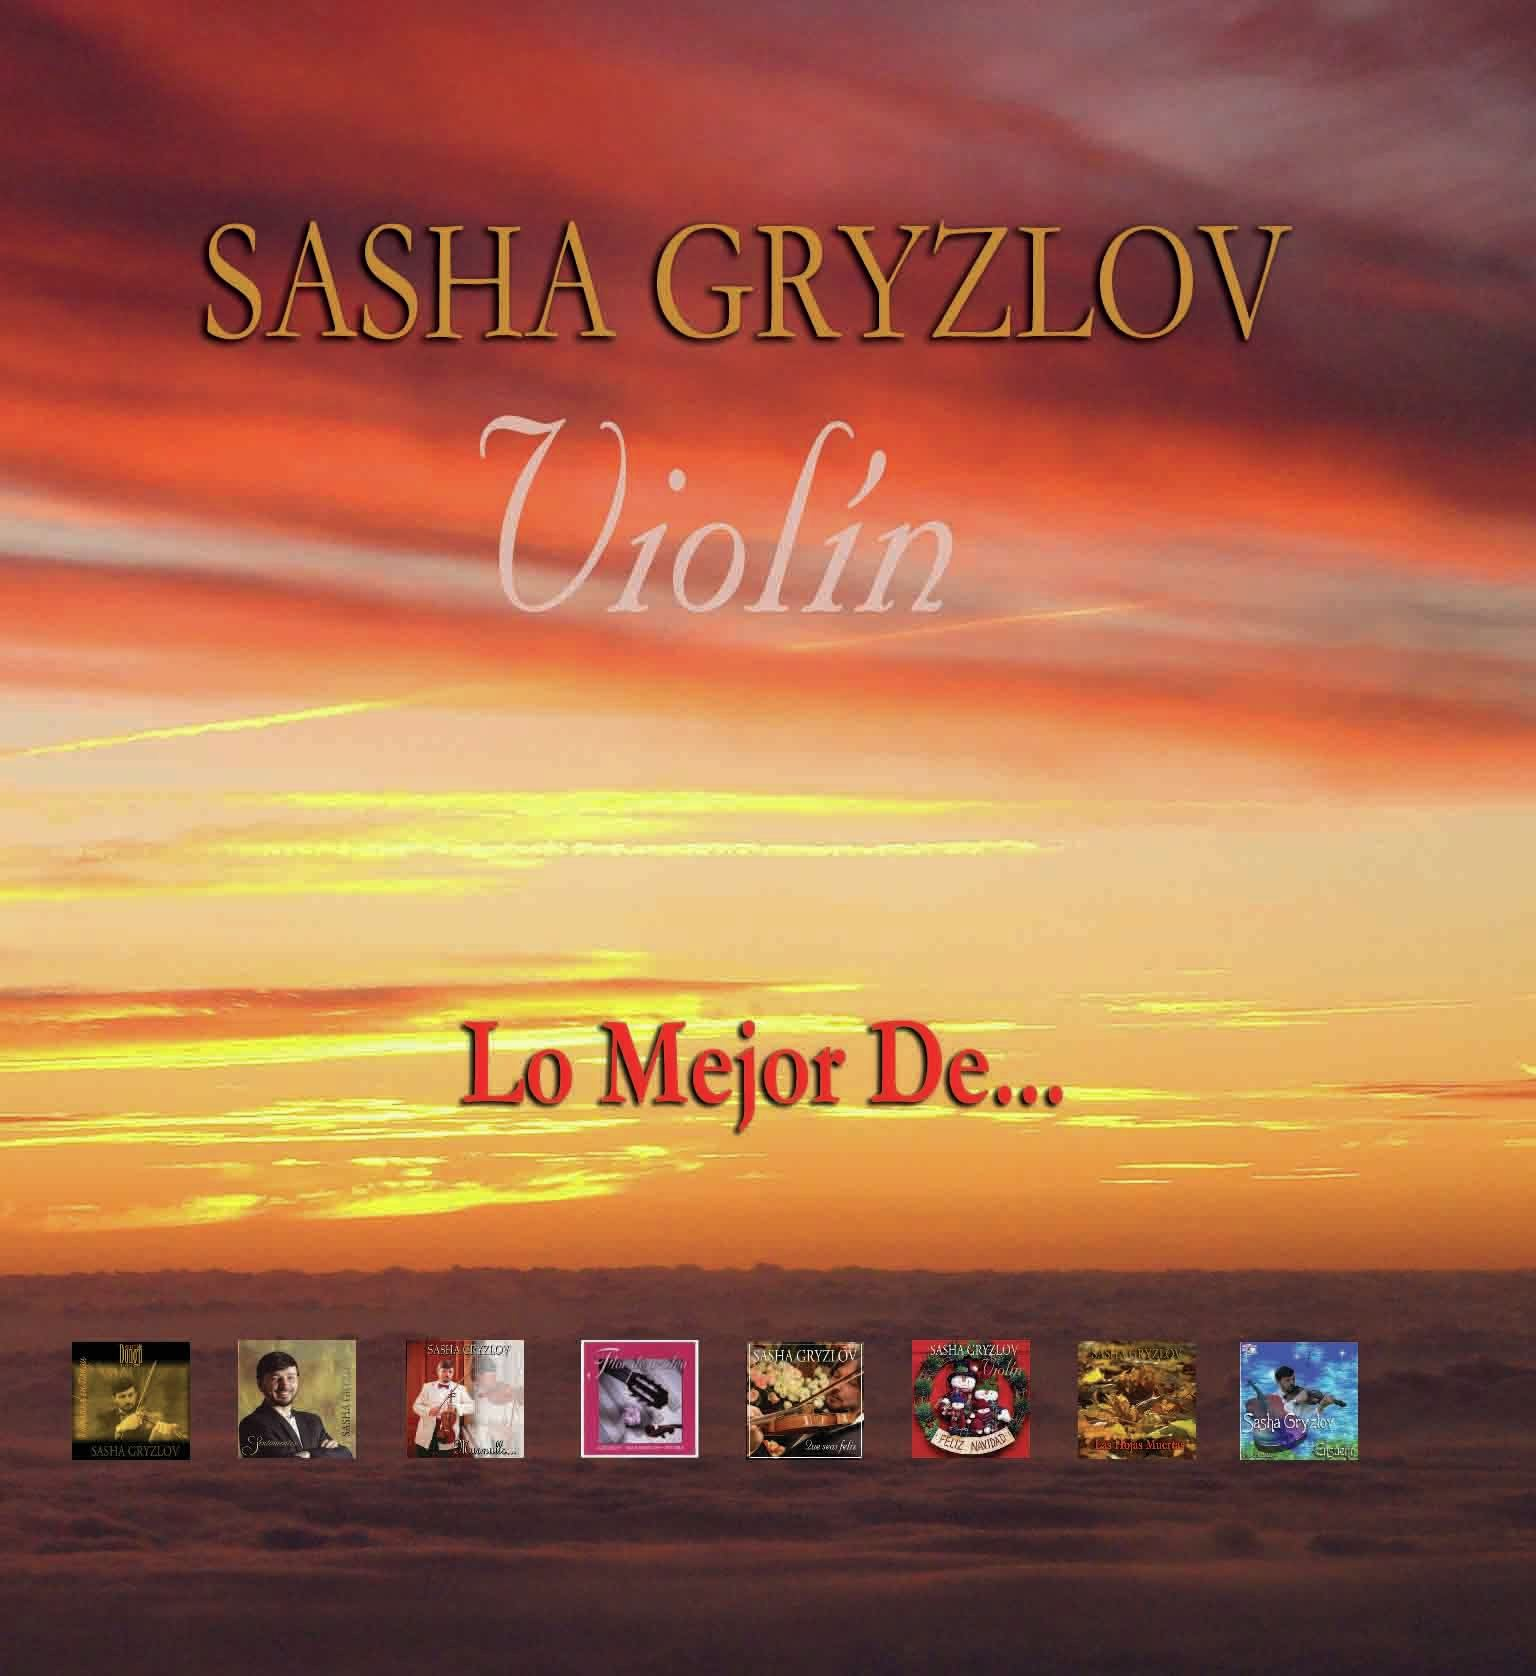 sasha gryzlov discografia